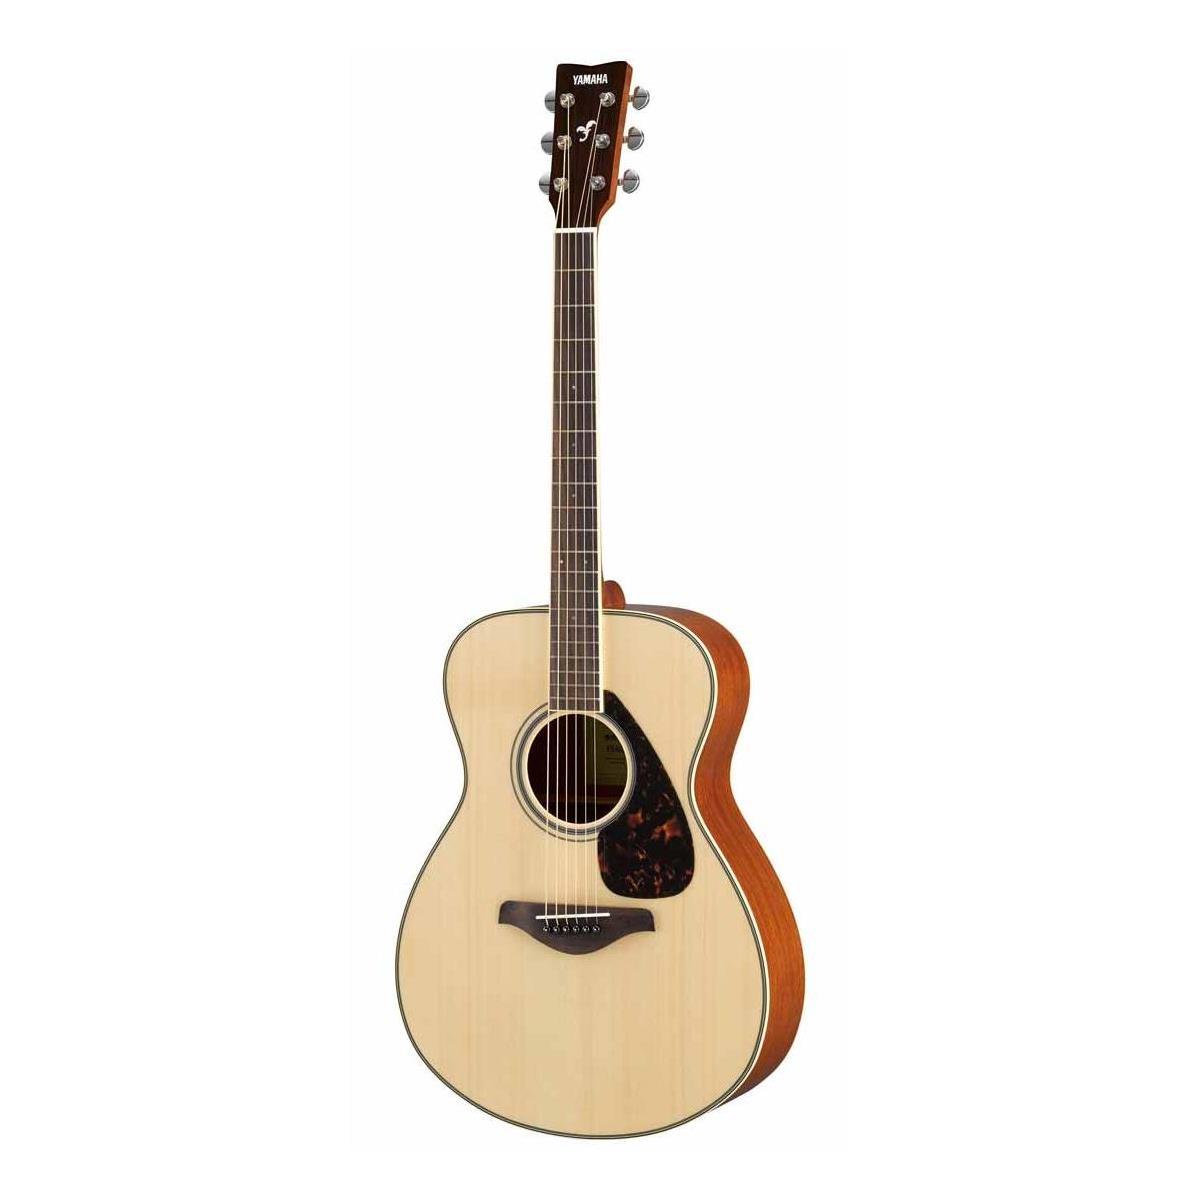 Yamaha Acoustic Guitars: FS820 $185, FG830 $230, FS830 $230 or FG850 $290 + free shipping